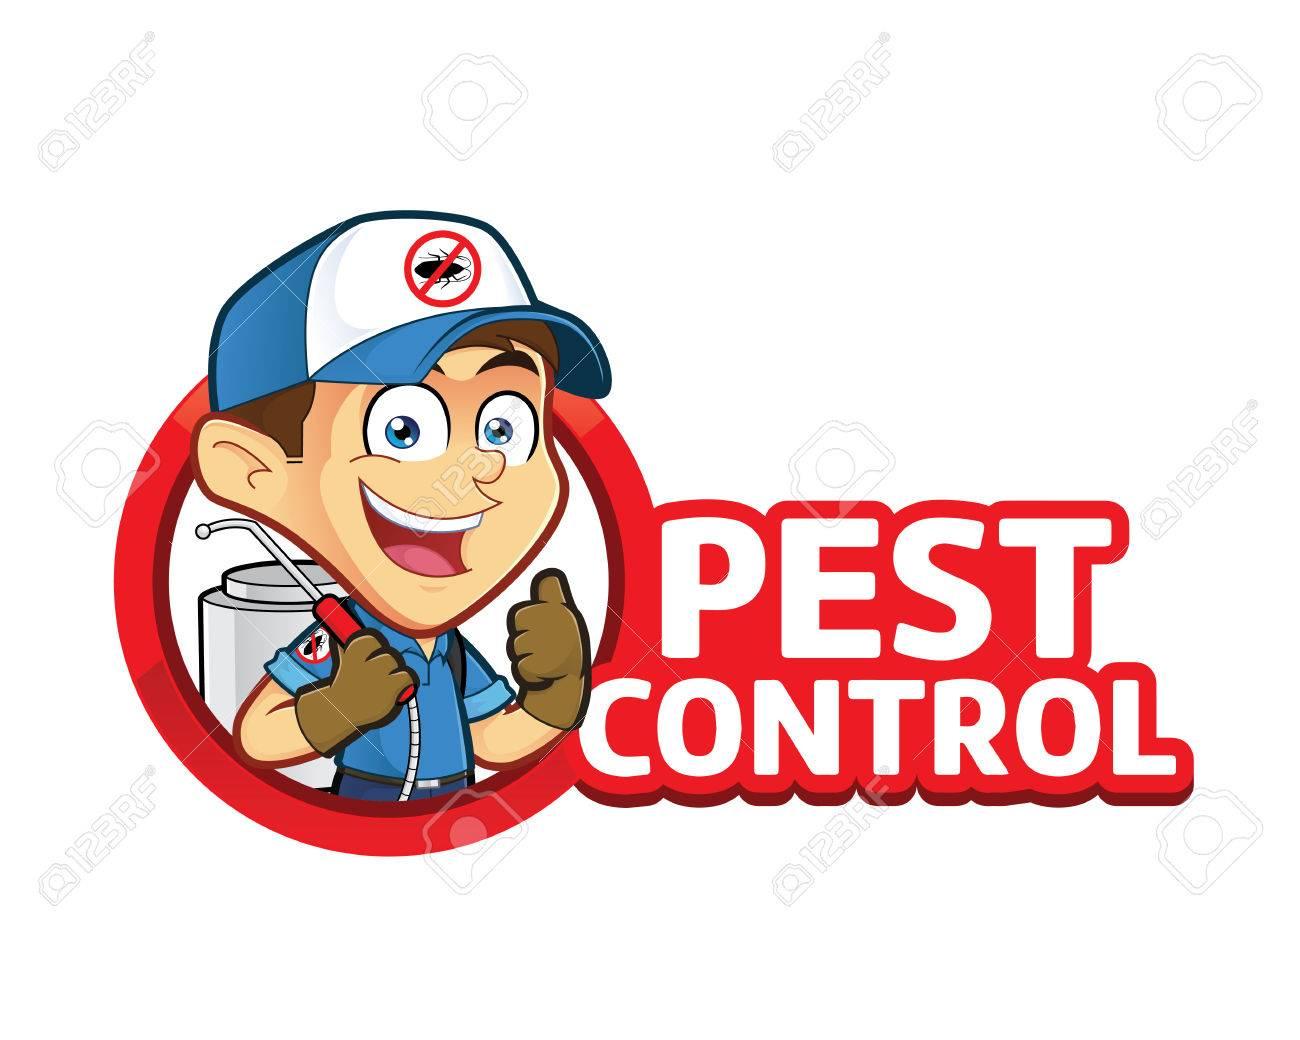 Exterminator or pest control with logo.